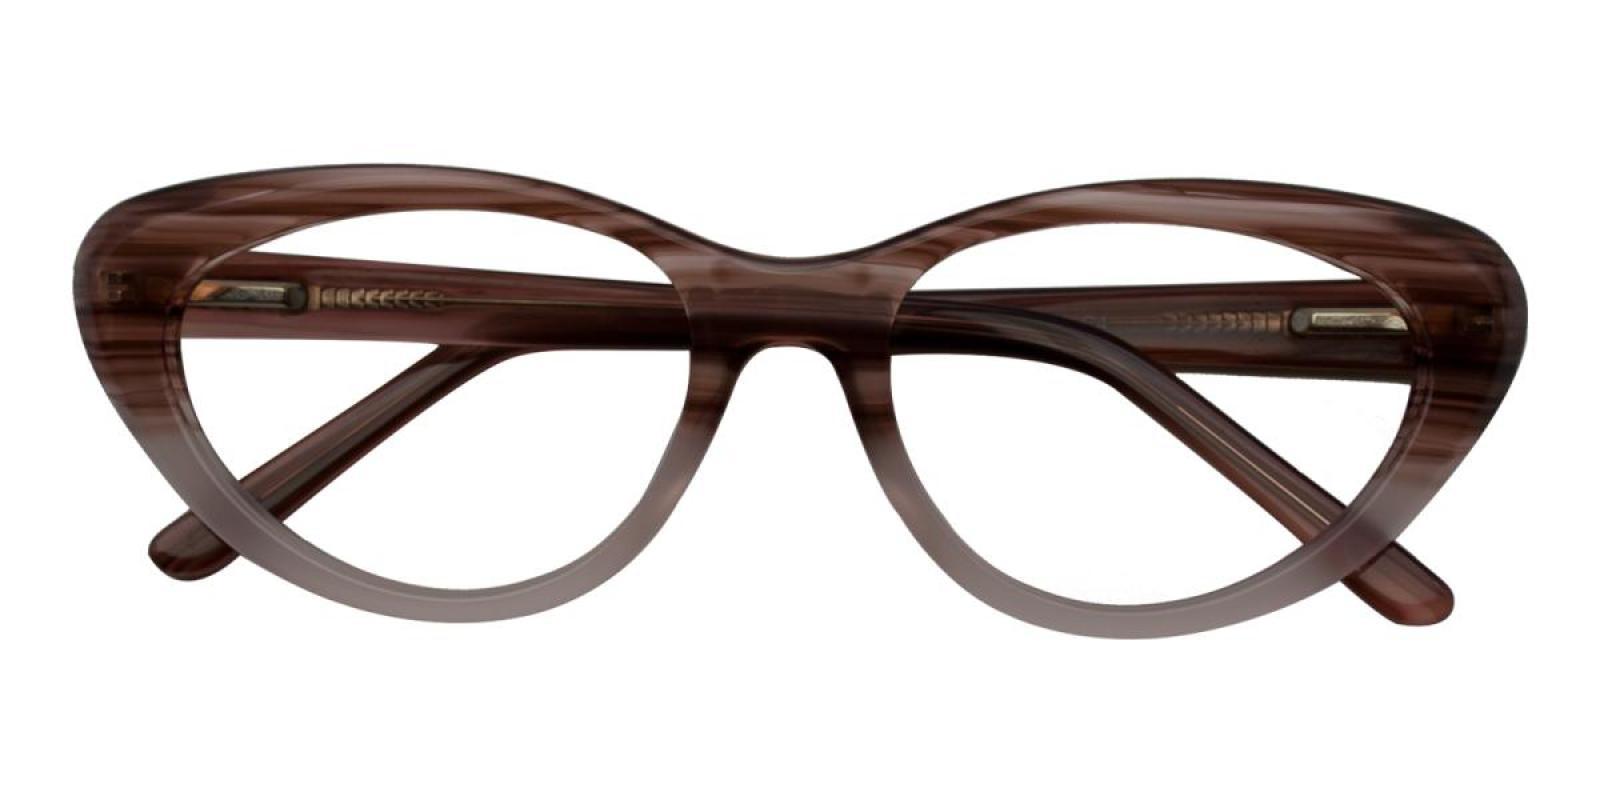 Jeanne-Cream-Cat-Acetate-Eyeglasses-detail